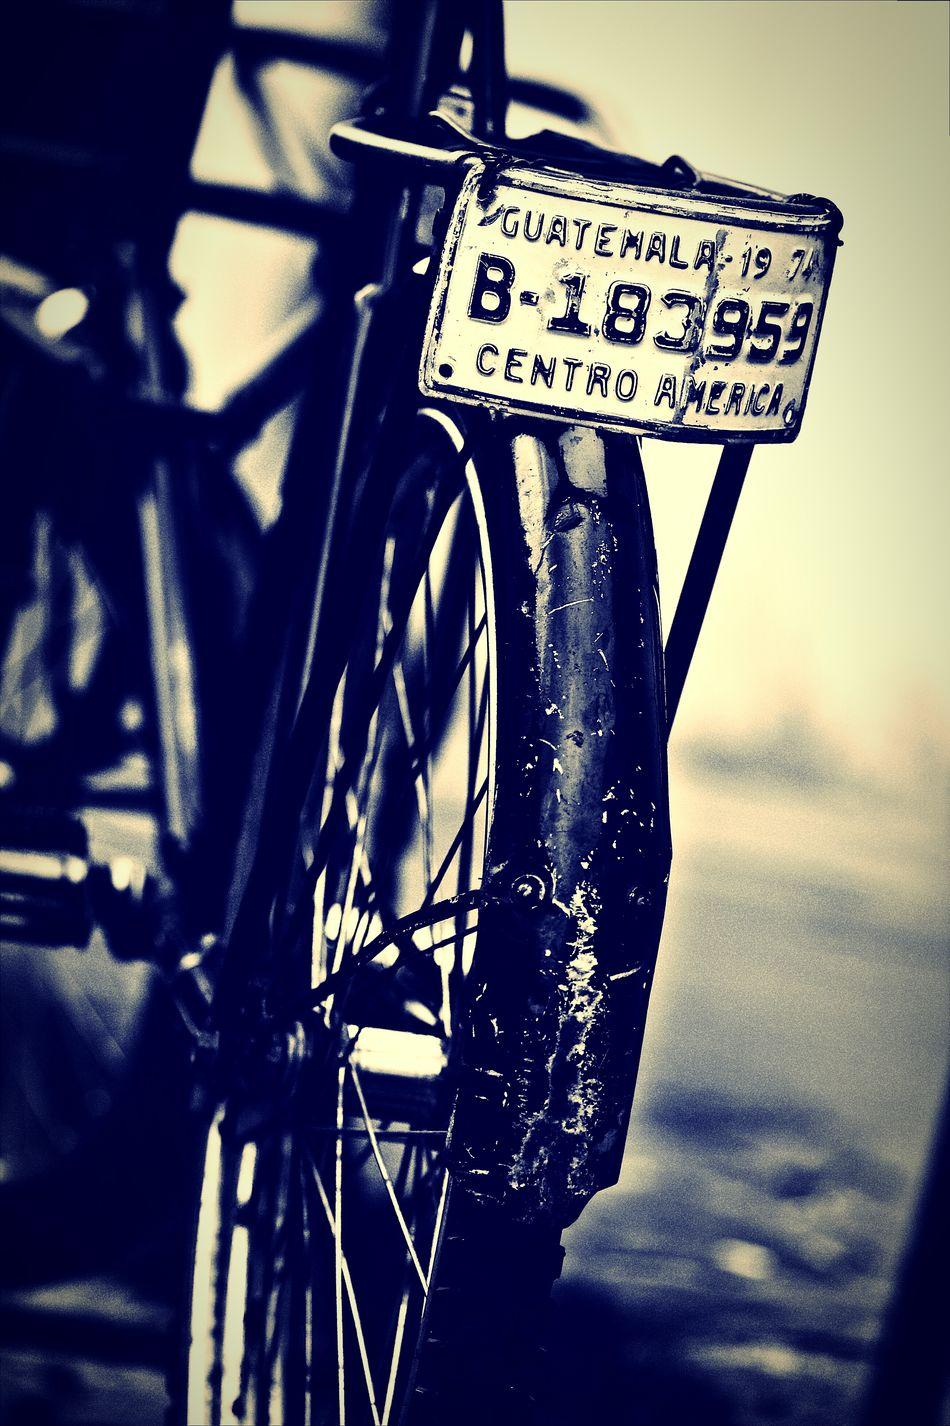 Bicicleta Bicycle Licenseplate Plaça Placa De Carro Old Old Bicycle BLCK&WHT Black And White Black & White Blanco Y Negro Bicicleta Vieja Old Bike Bike Chain Cadena De Bicicleta Fine Art Photography Still Life Urban Photography Street Photography Fine Art Pivotal Ideas Travel